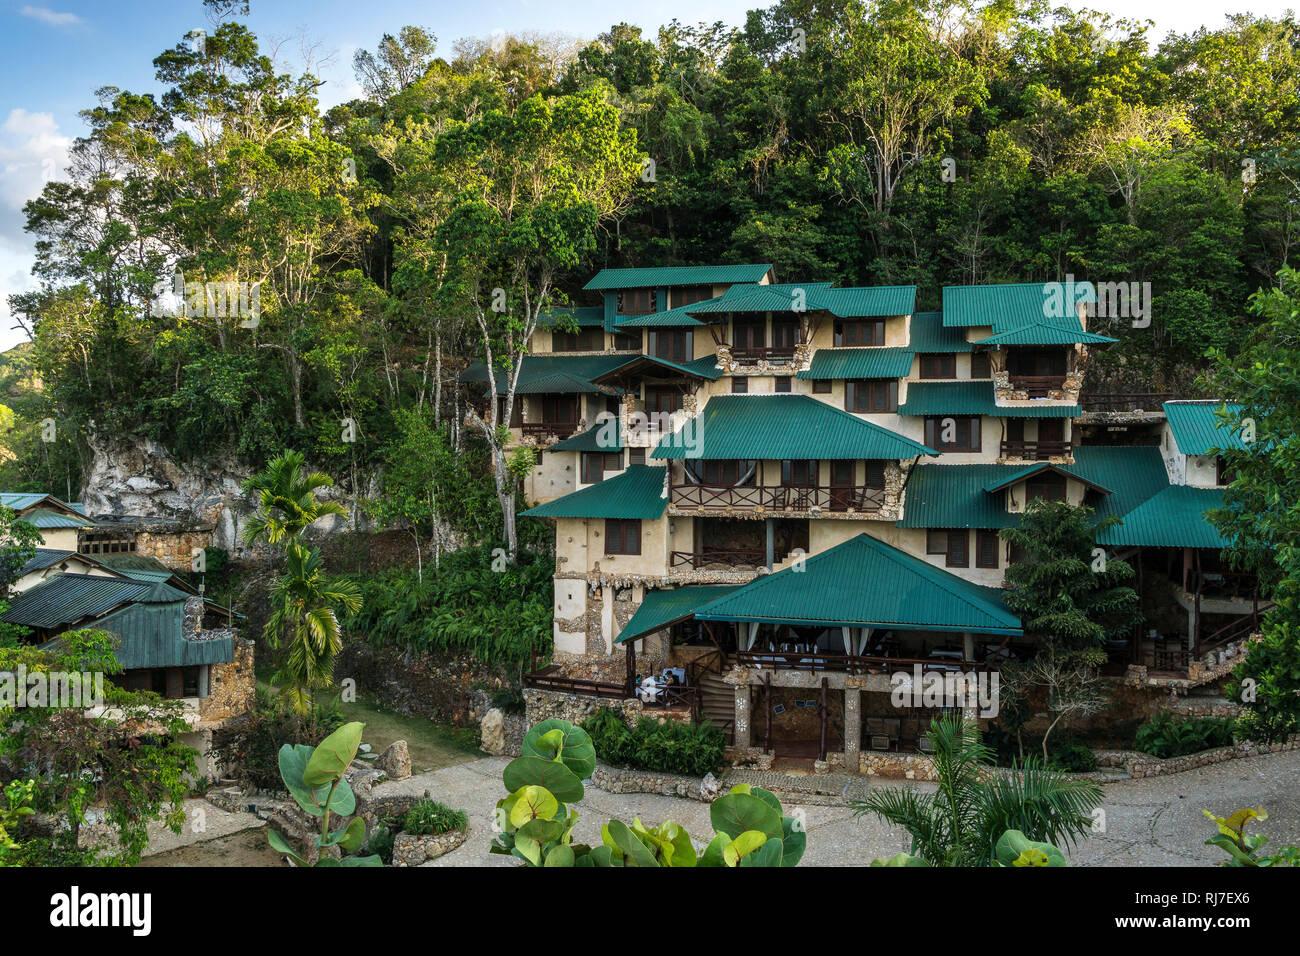 Große Antillen, Karibik, Dominikanische Republik, Samana, Los Haitises, ökologisches Hotel im Nationalpark Los Haitises Stock Photo